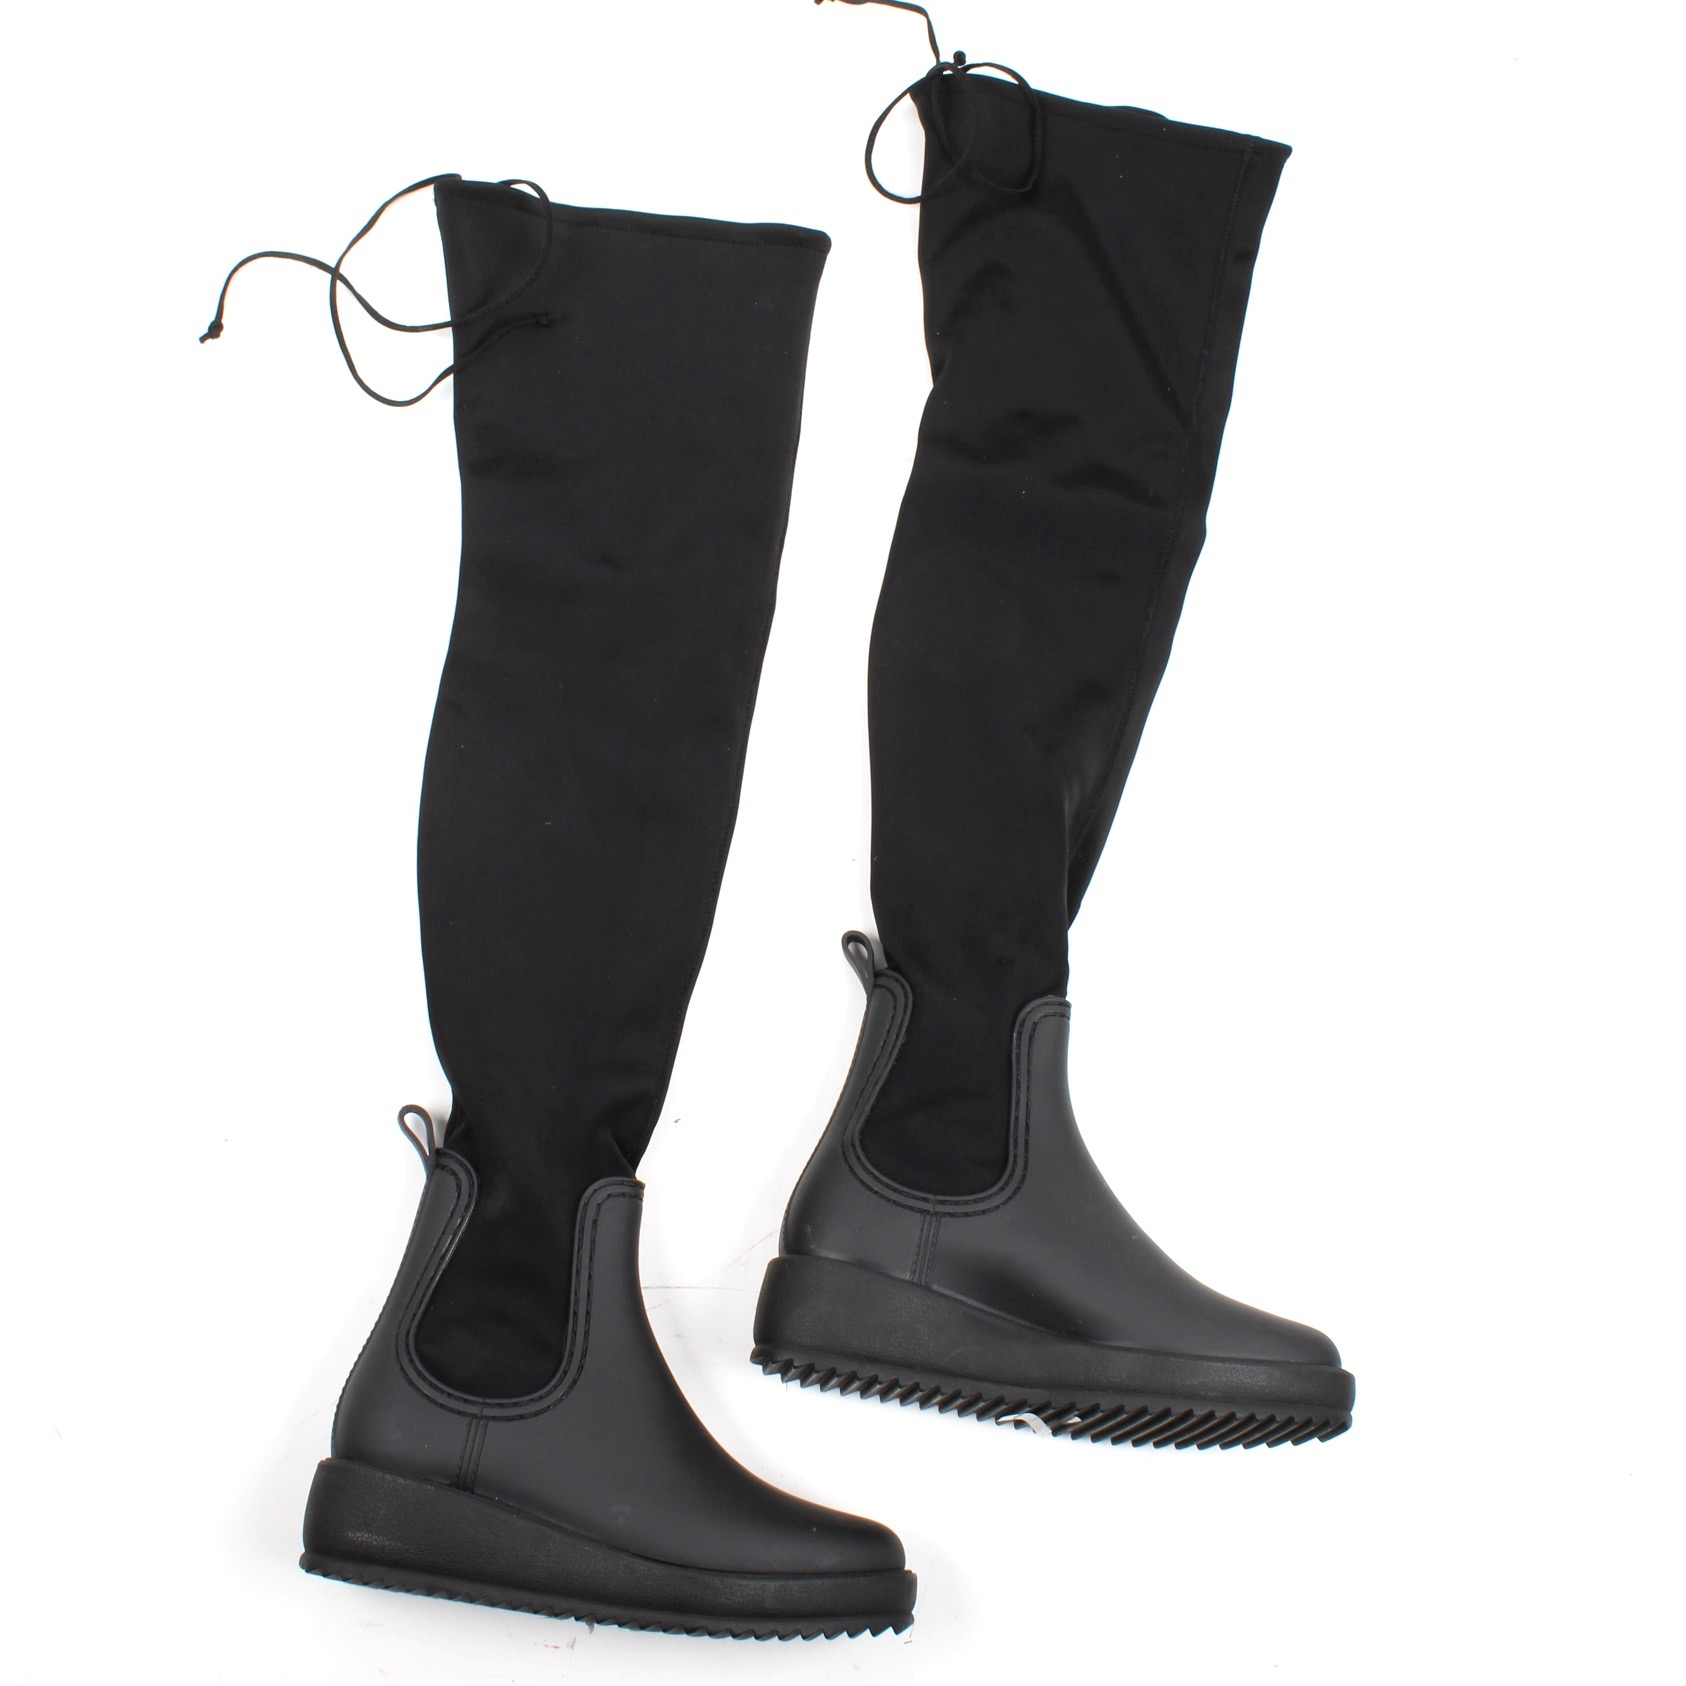 Jeffrey Campbell Monsoon Over-the-Knee Platform Rain Boot 4Xyk4s